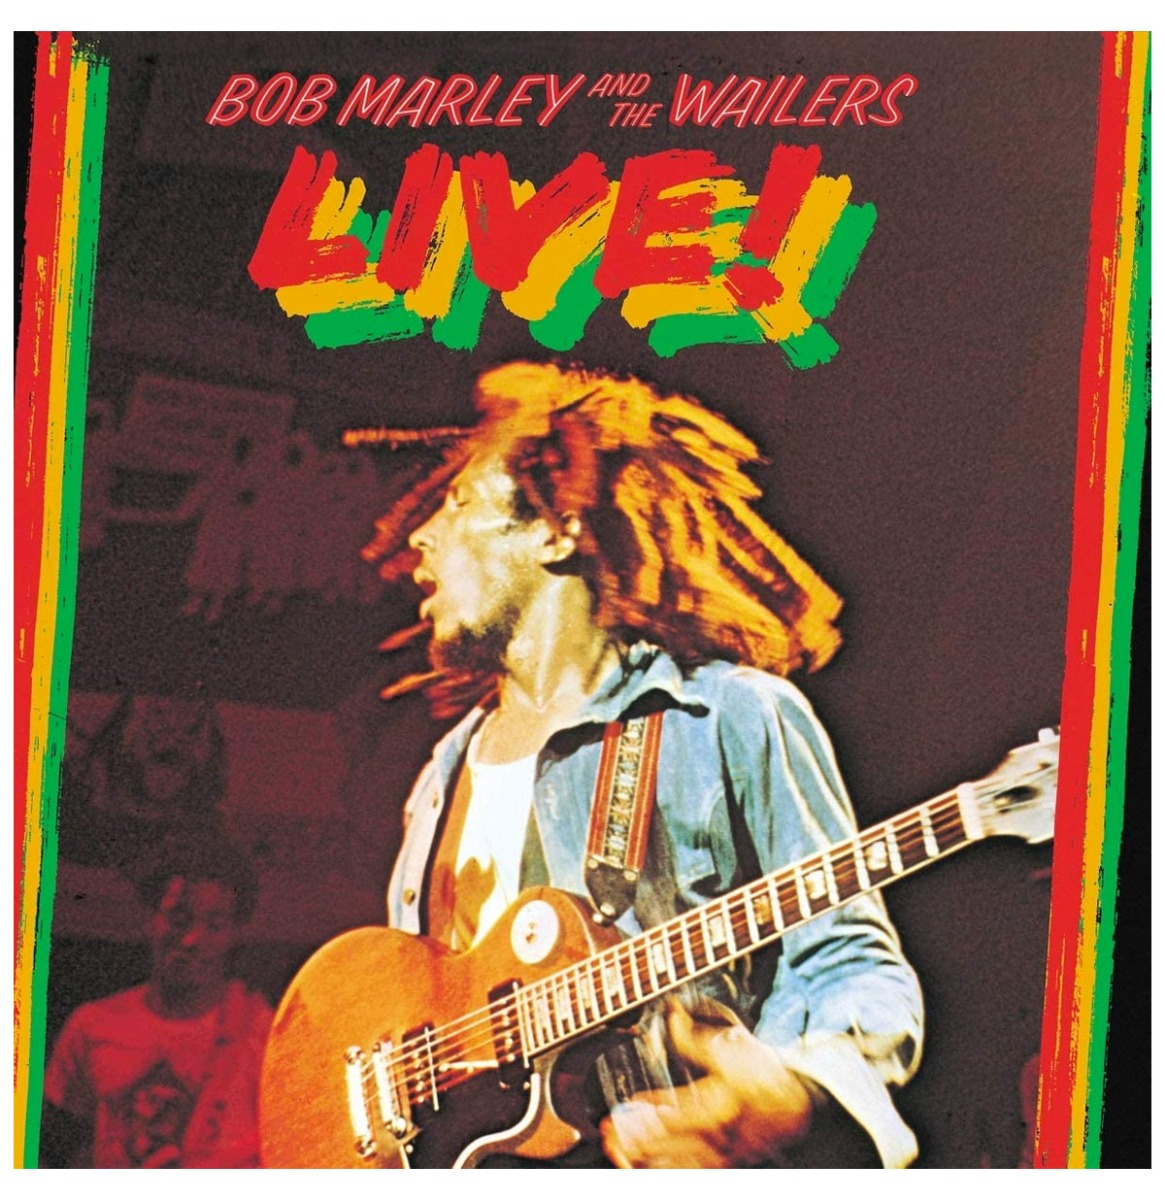 Bob Marley and the Wailers LIVE! 3LP